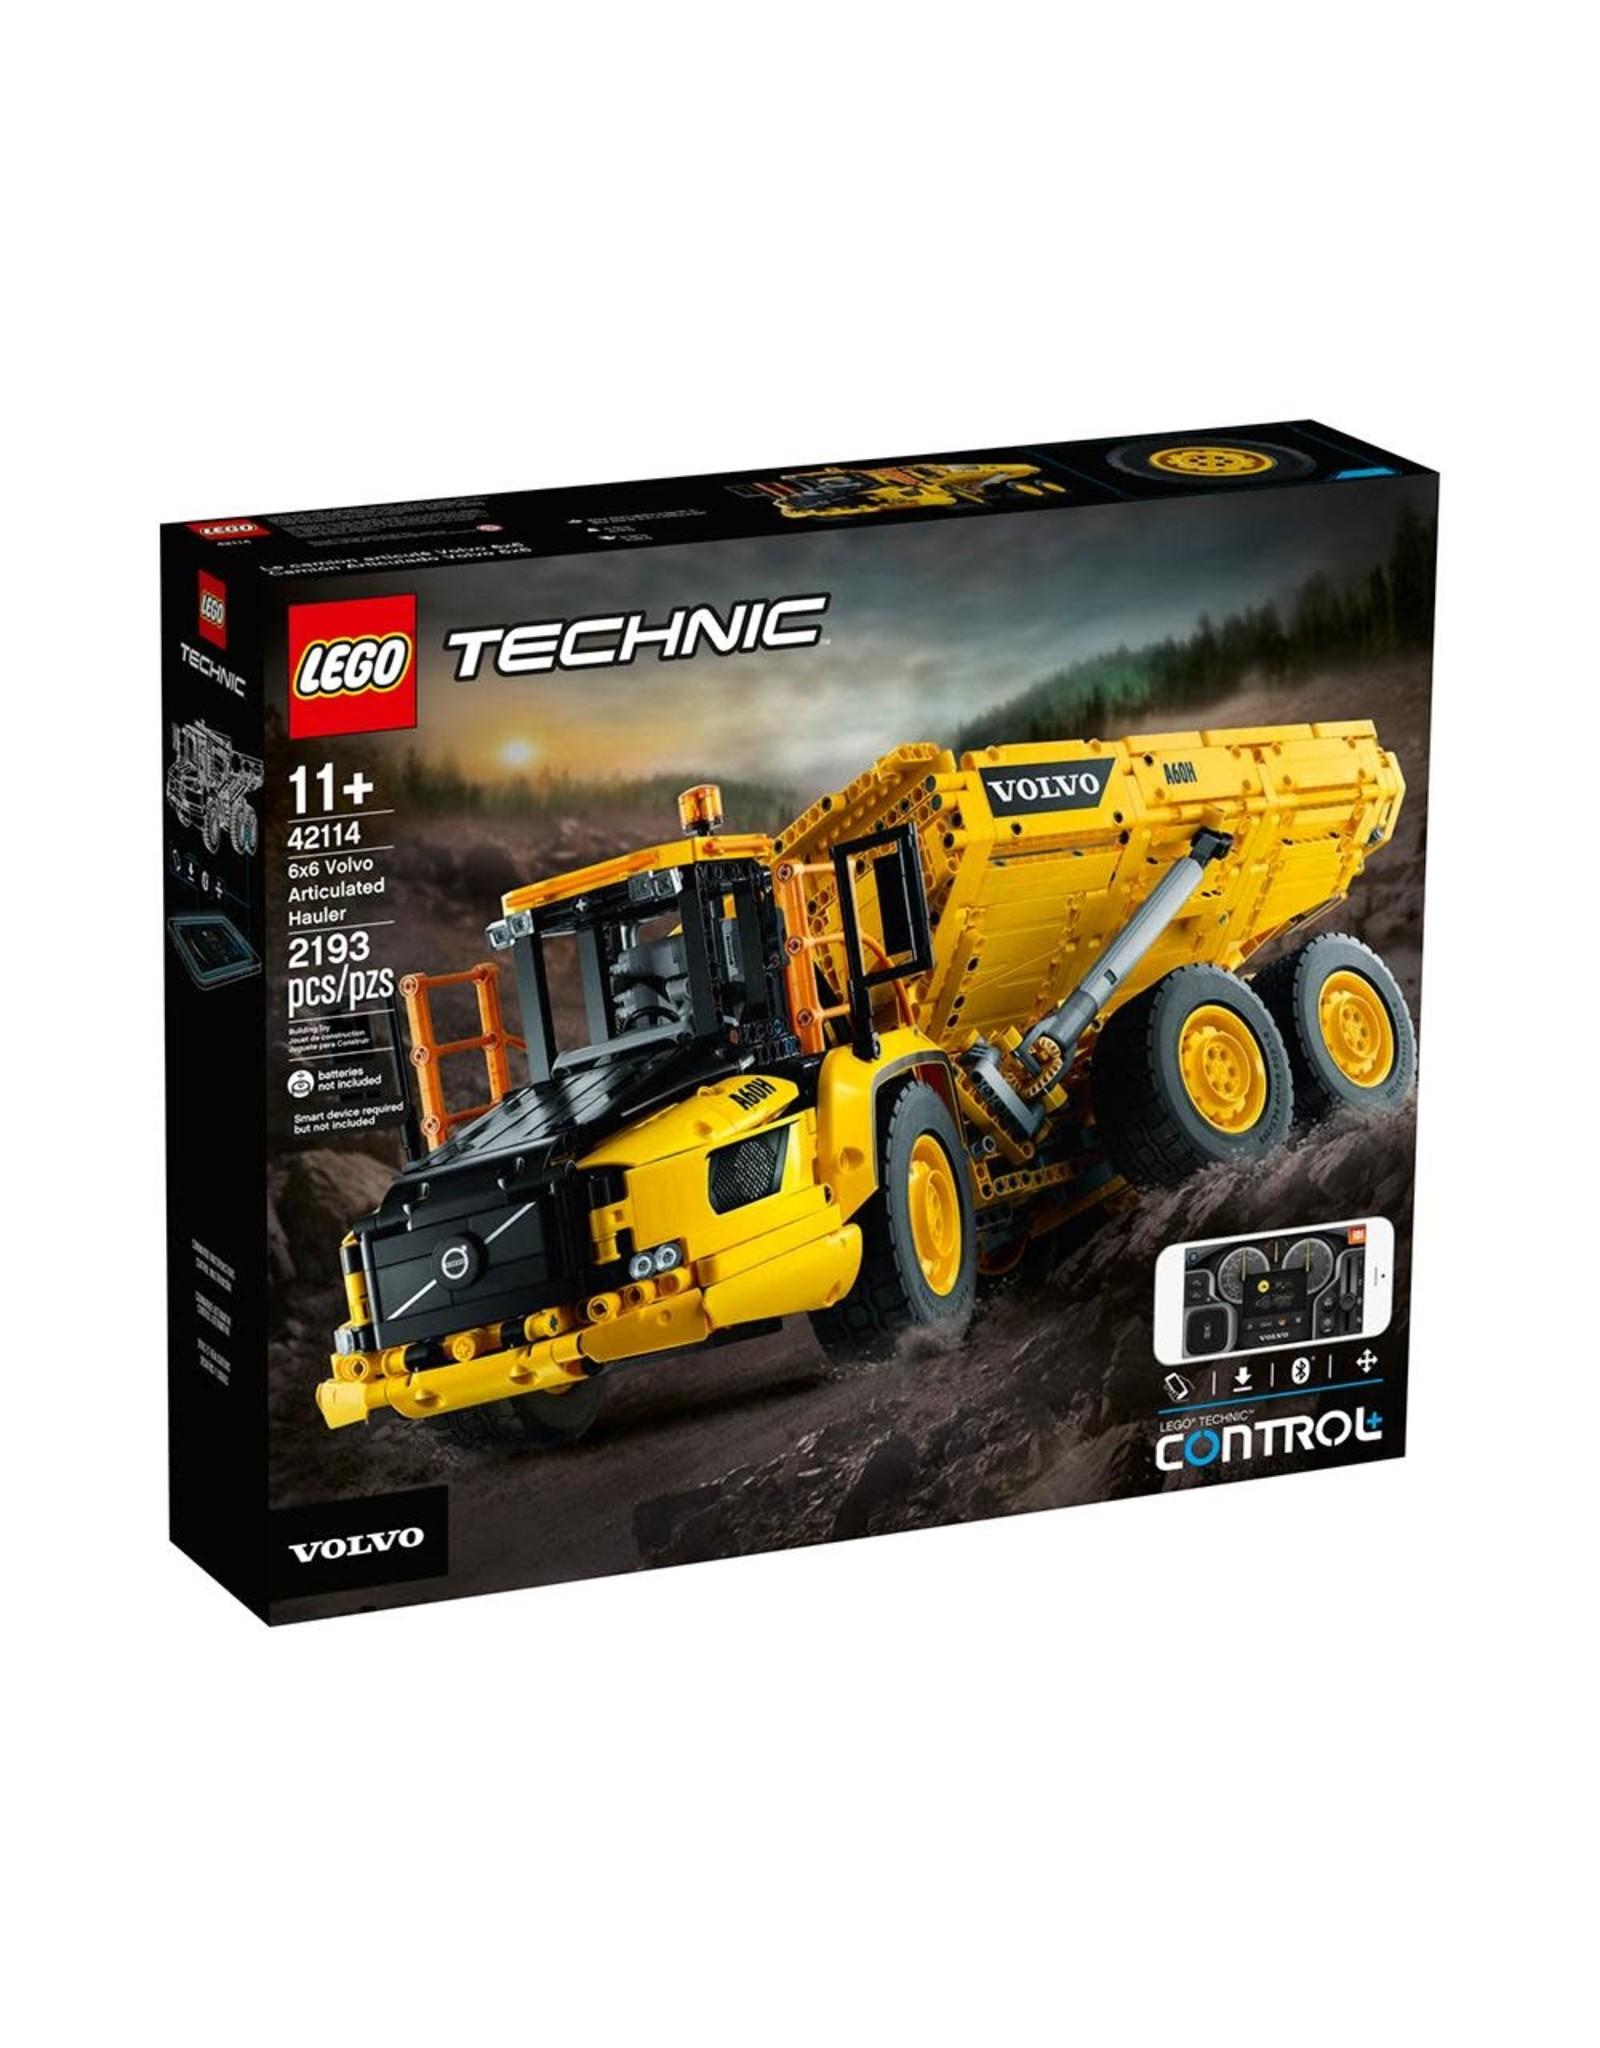 LEGO Technic - 42114 - 6X6 Volvo Articulated Hauler